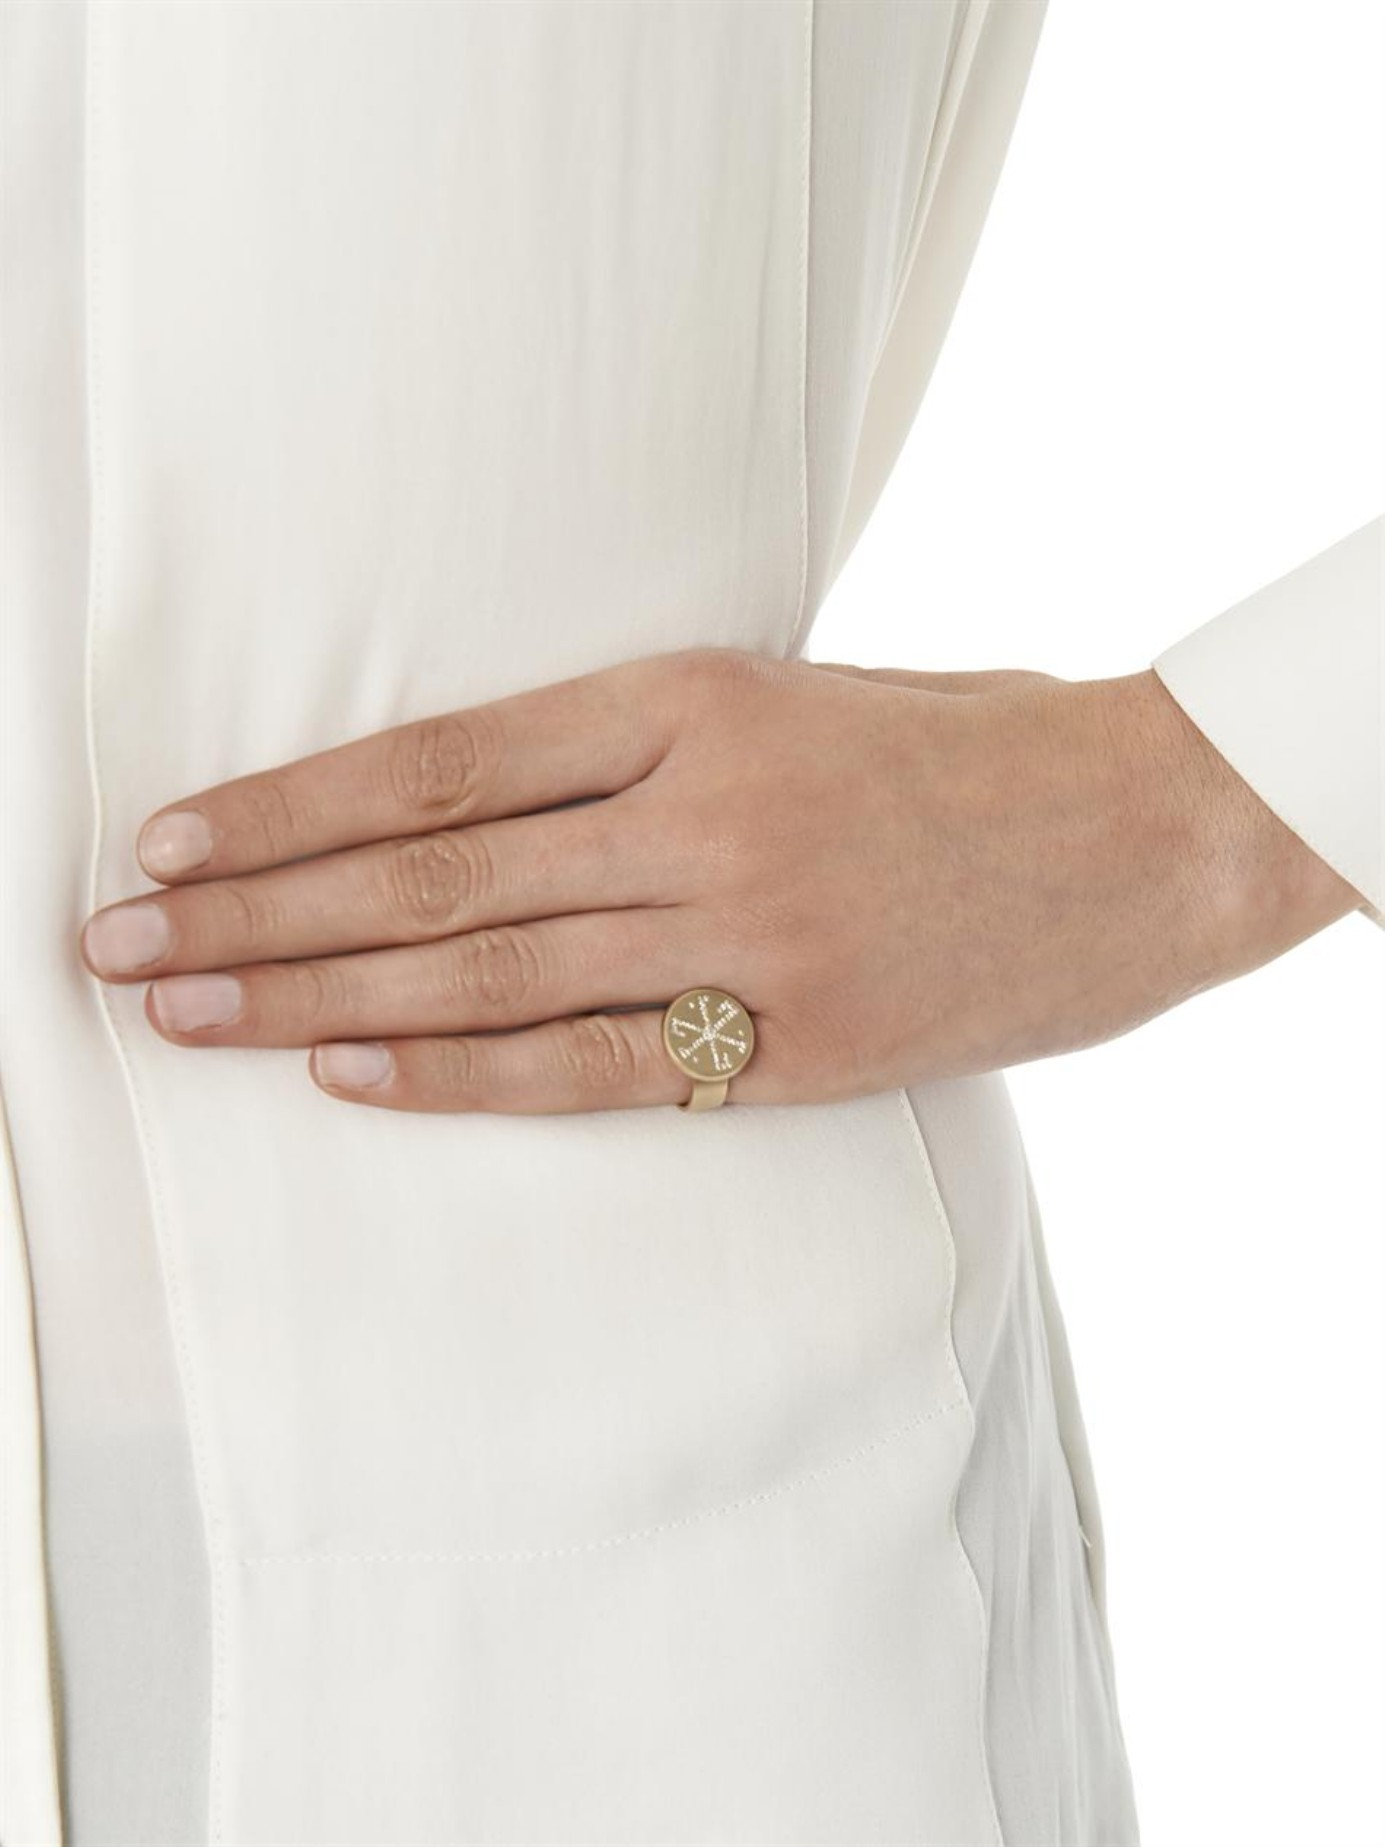 Diamond Pinky Rings for Women – Jewelry